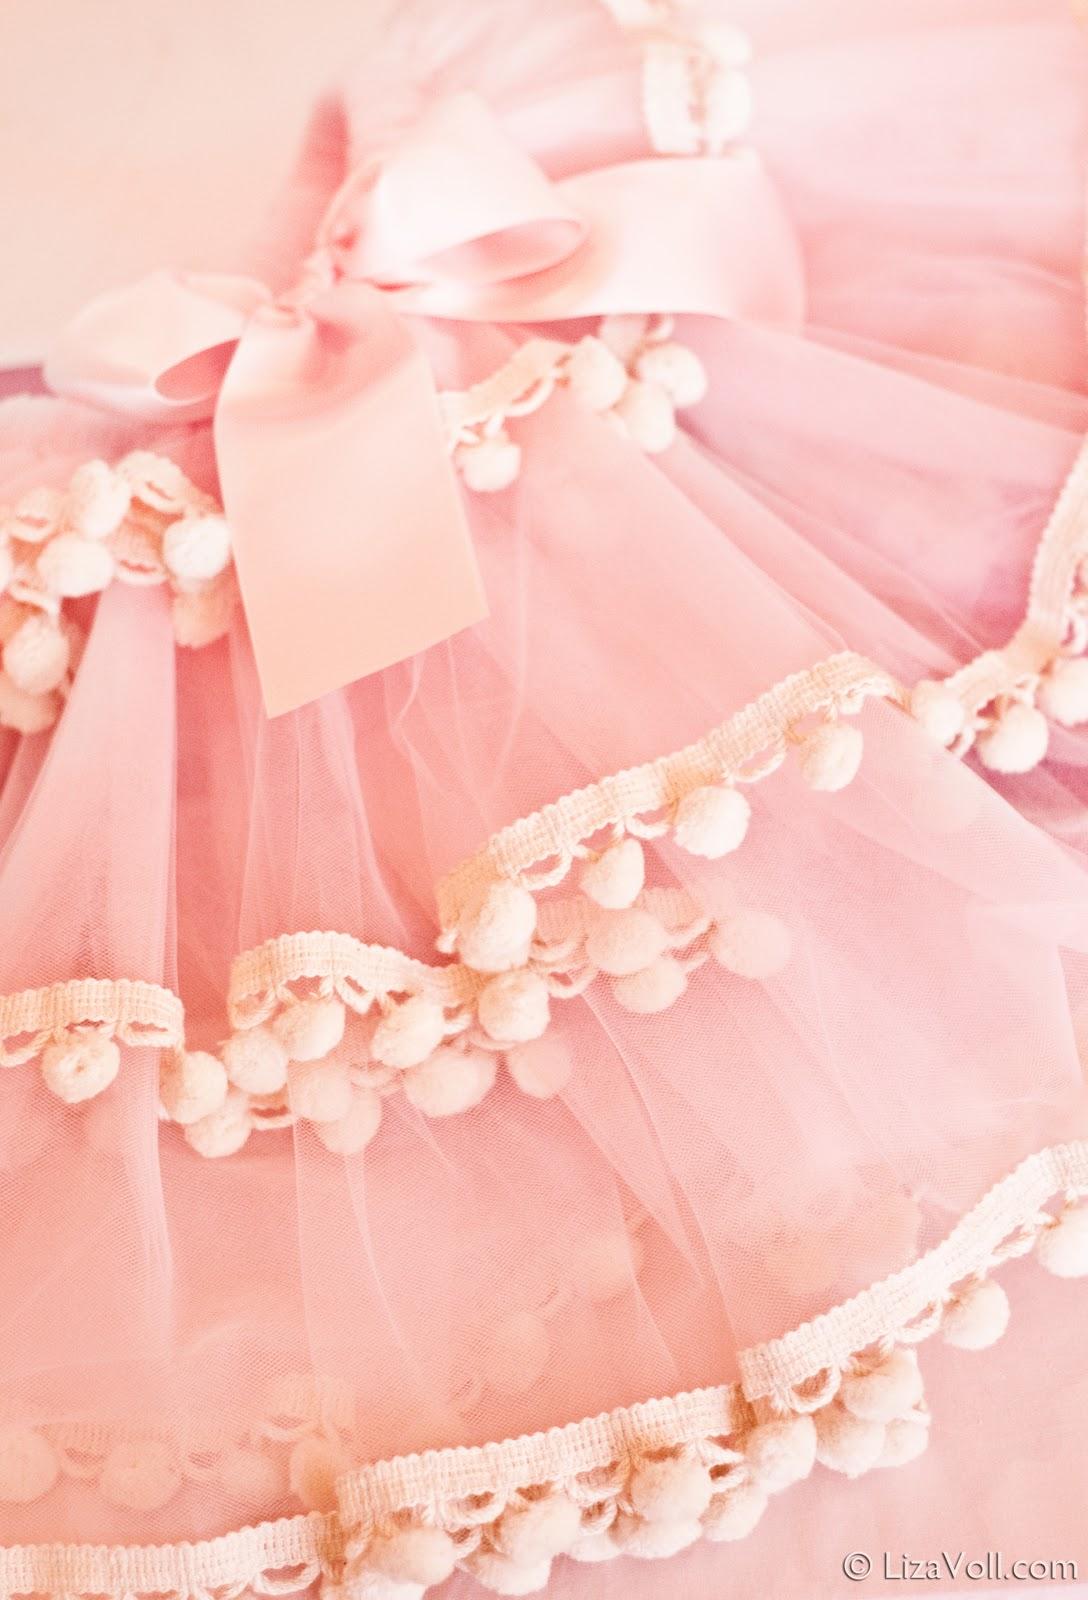 http://3.bp.blogspot.com/_XC3yUCVYgvo/TUtCrzsff7I/AAAAAAAAFHo/zpNwdxEMvuI/s1600/Sugarplum+Party+%25C2%25A9+Liza+Voll-102.jpg